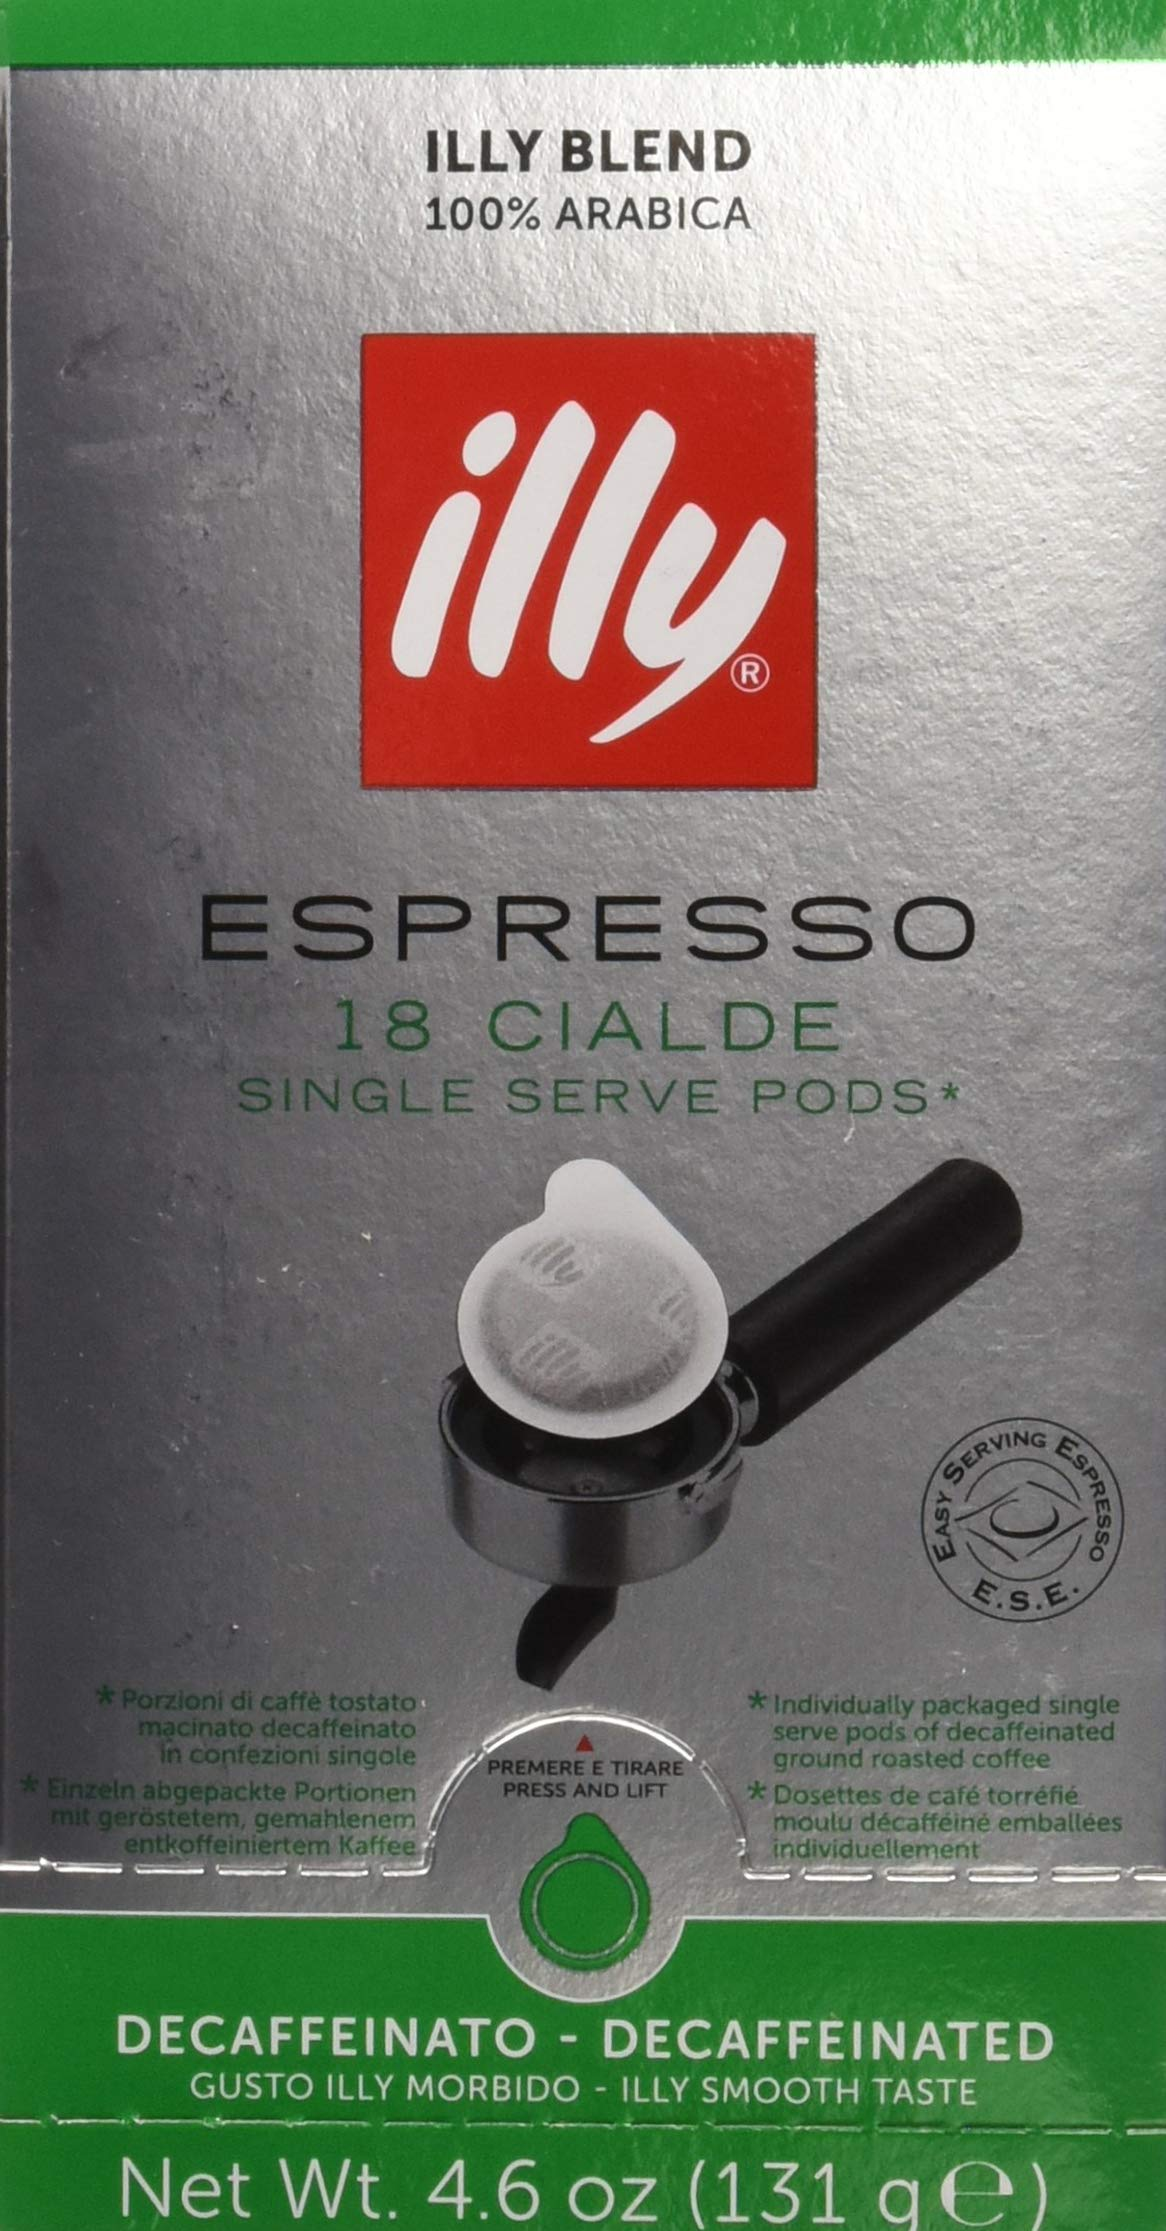 Illy E.S.E Espresso Pods - Decaf - 18 Count